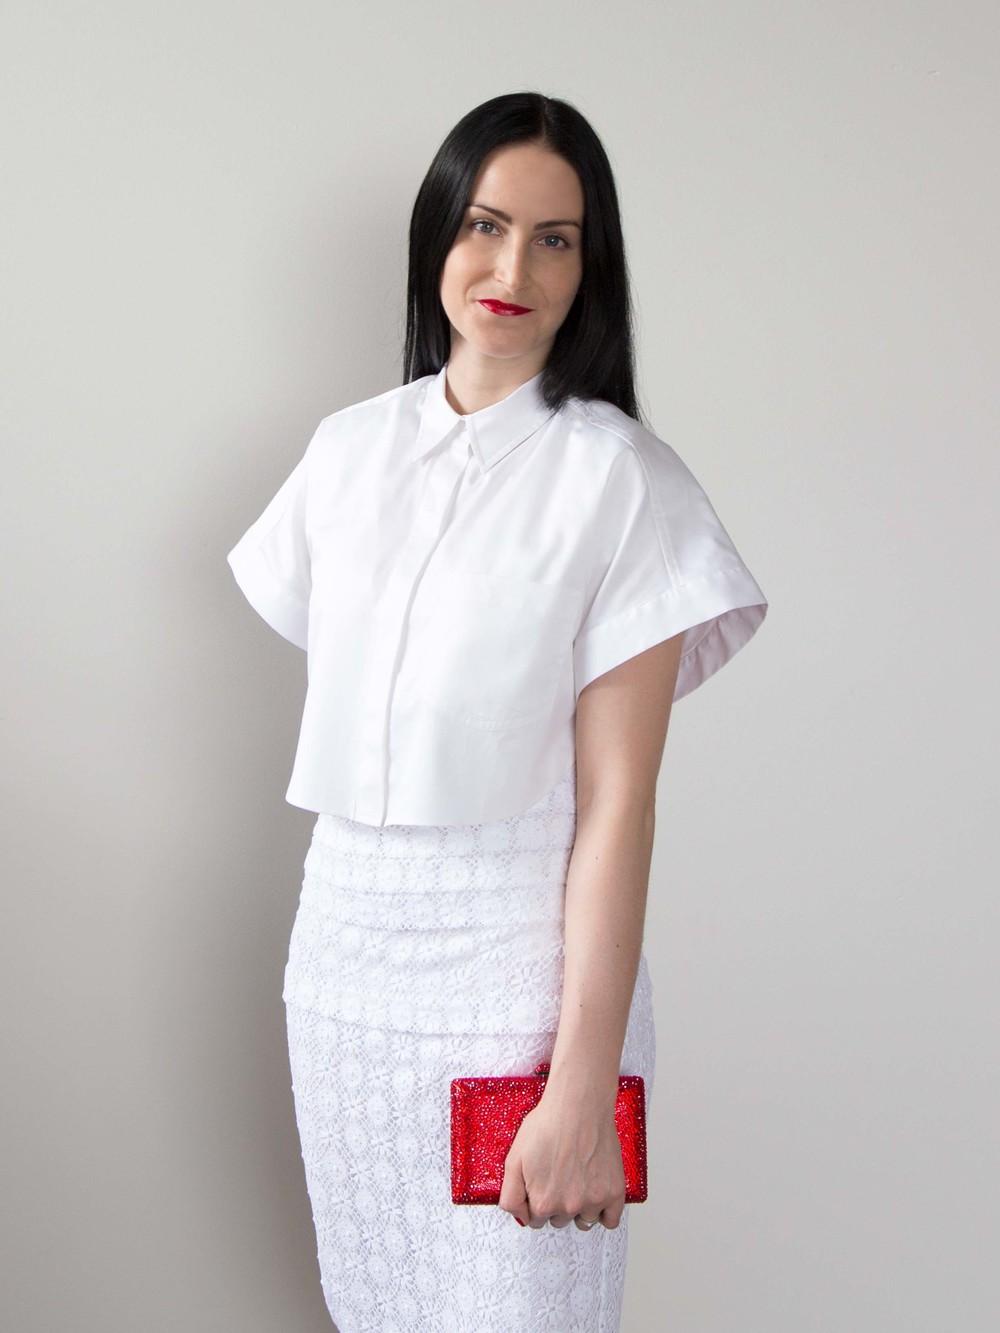 LOVER® White Crop Shirt, Burberry Prorsum English Lace V-Neck Dress, Swarovski Clutch